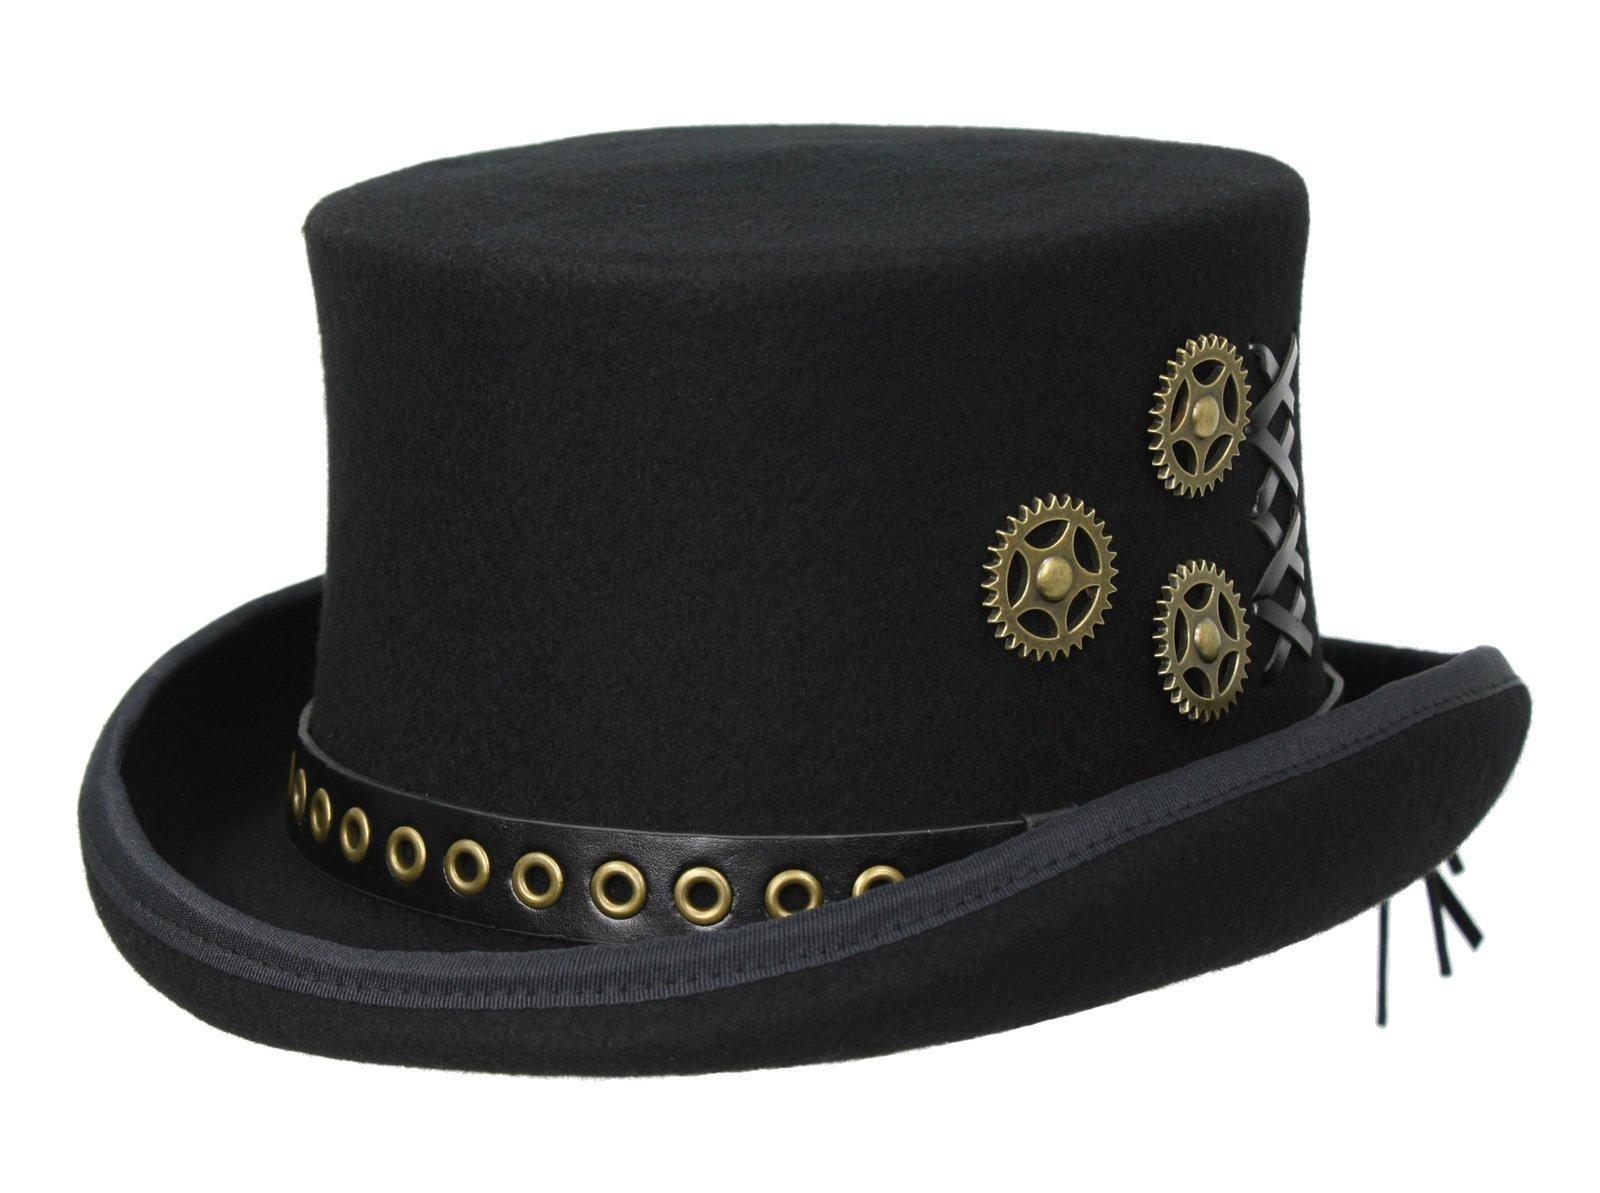 Australian Wool Steampunk Top Hat, Black (Large)